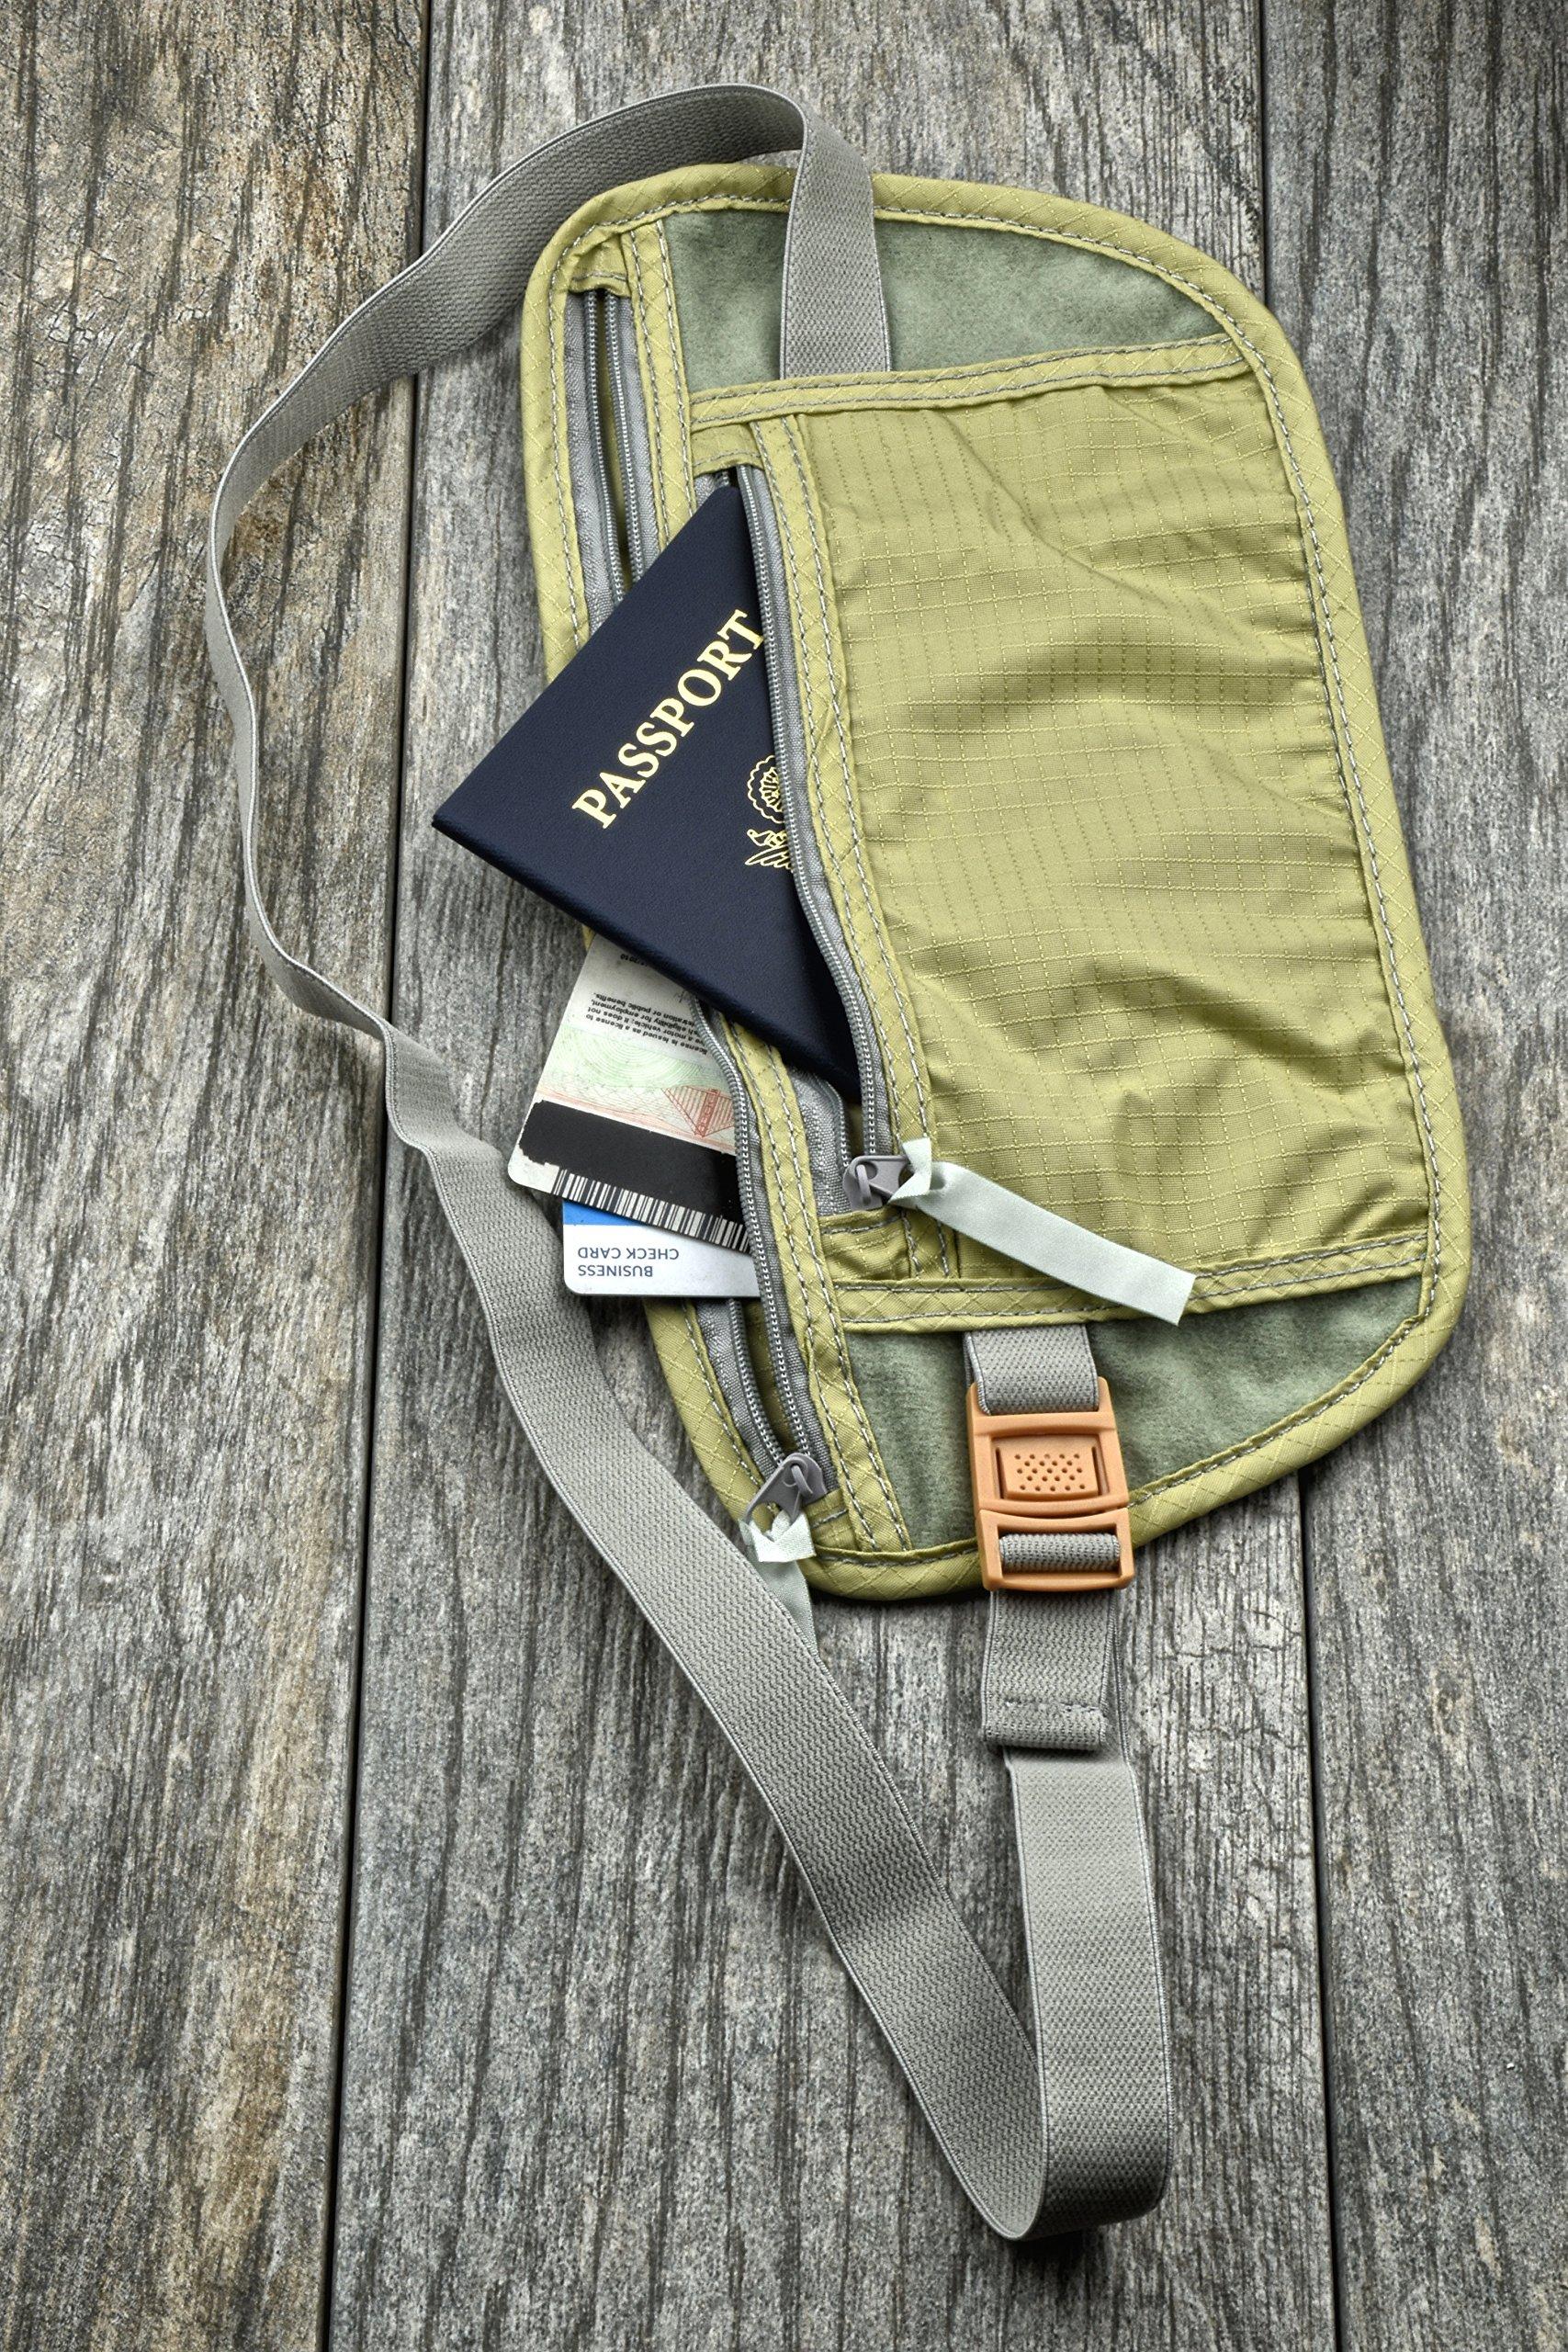 SE TP101-POUCH Concealed Dual Zipper Travel Pouch by SE (Image #2)